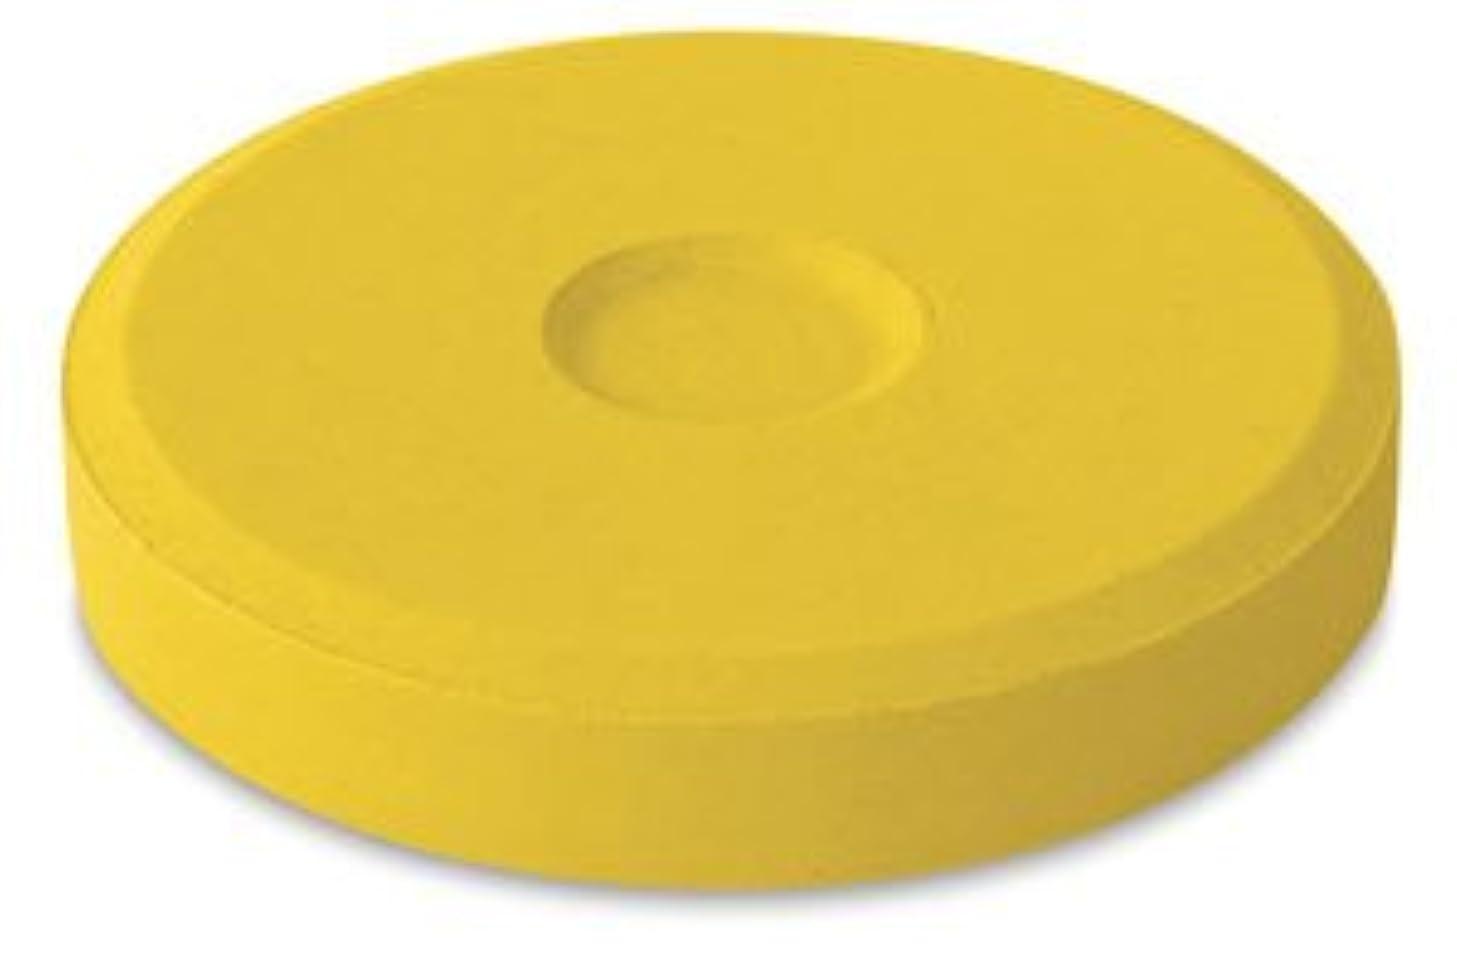 Jack Richeson 101108 Mini Deep Gold Tempera Paint Block, 6 Pack